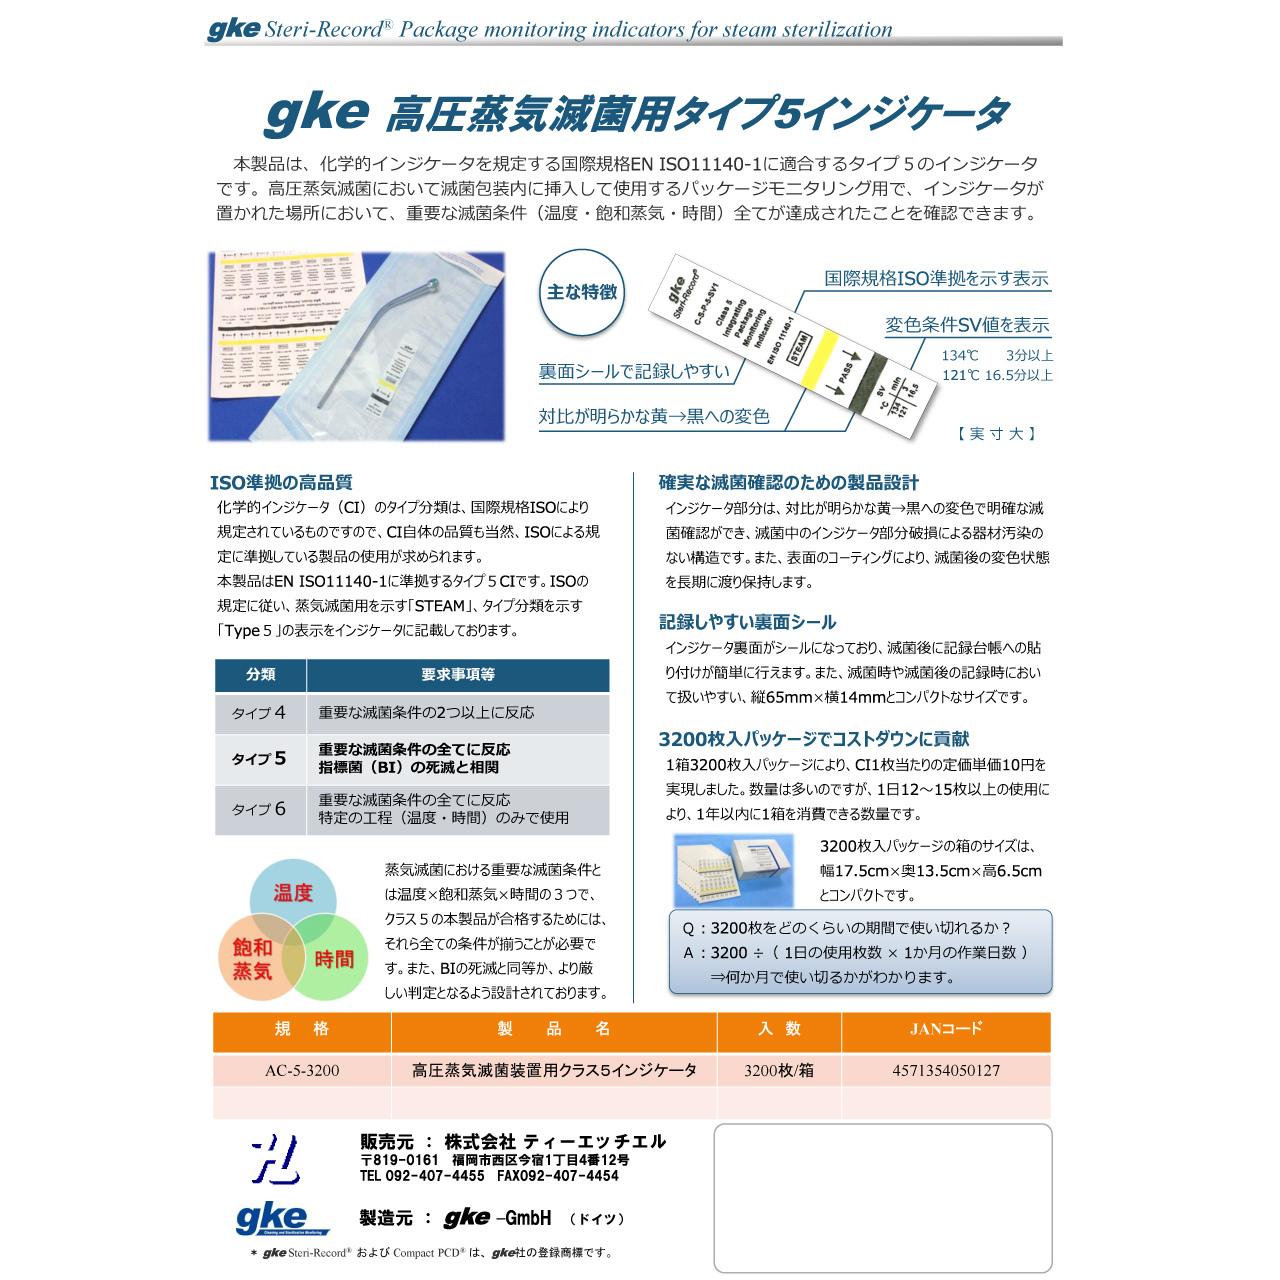 gke高圧蒸気滅菌用タイプ5インジケータ